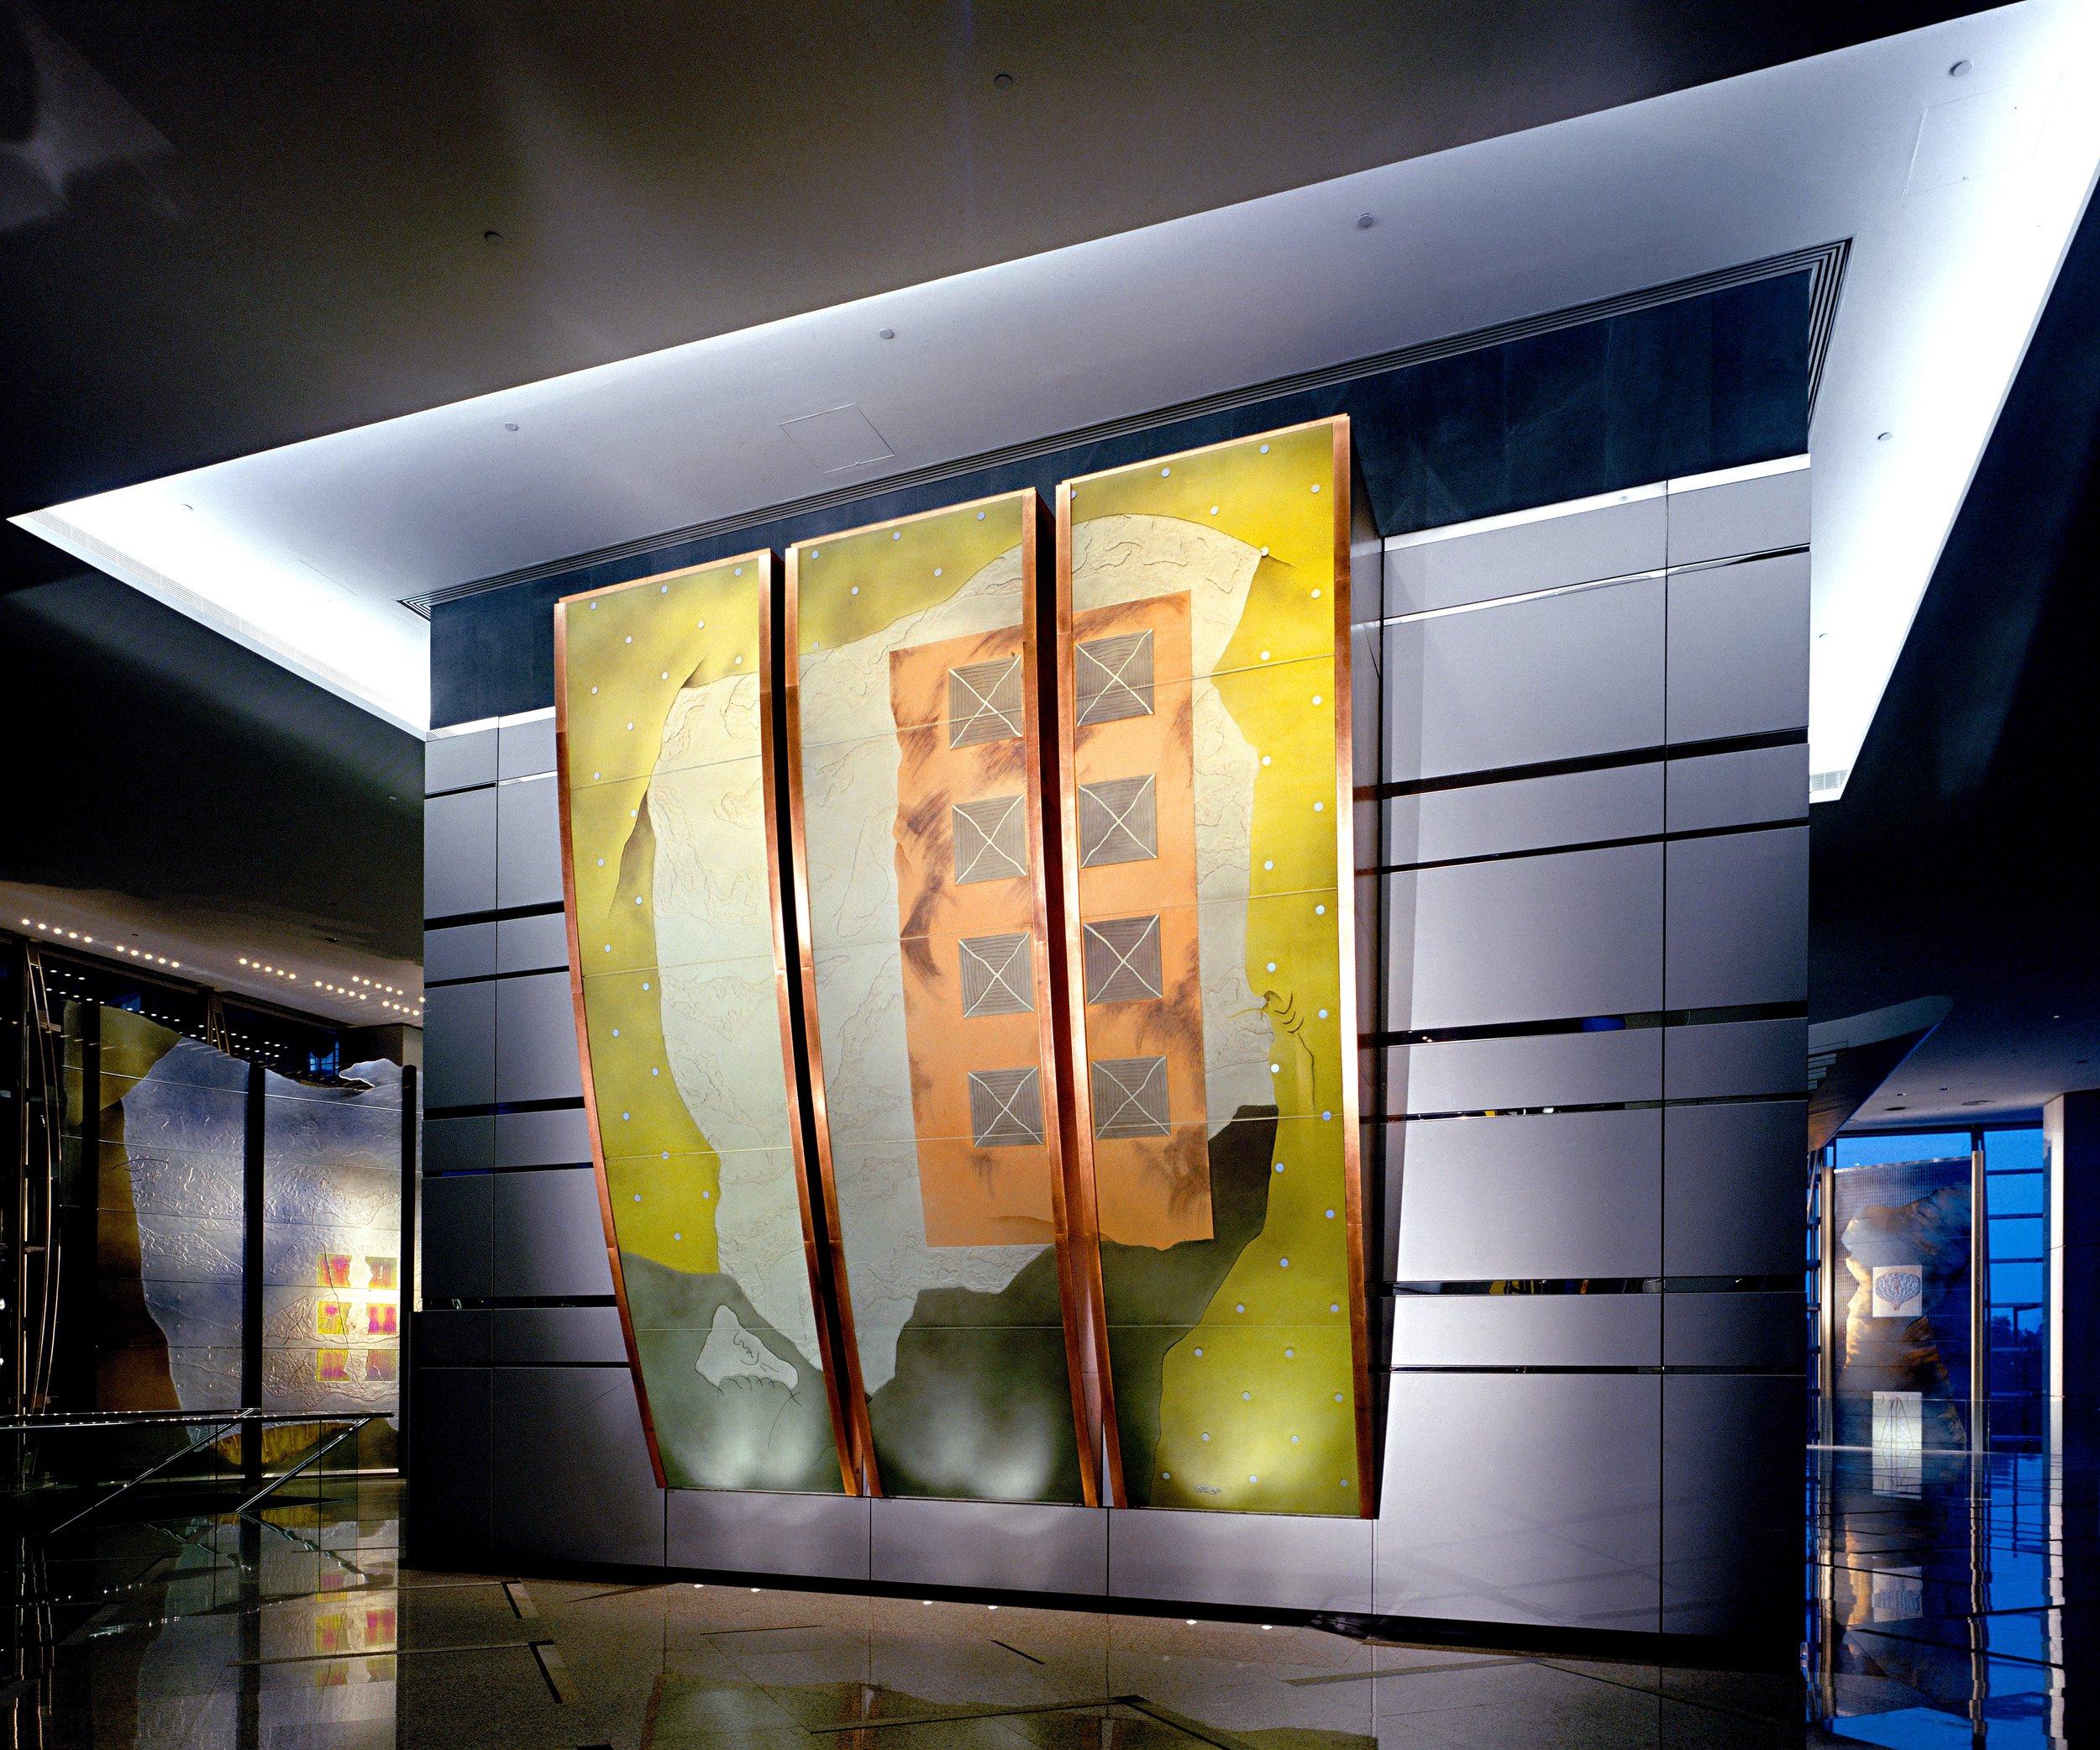 Part 1 of Chronos Trilogy | Lincoln House, Hong Kong